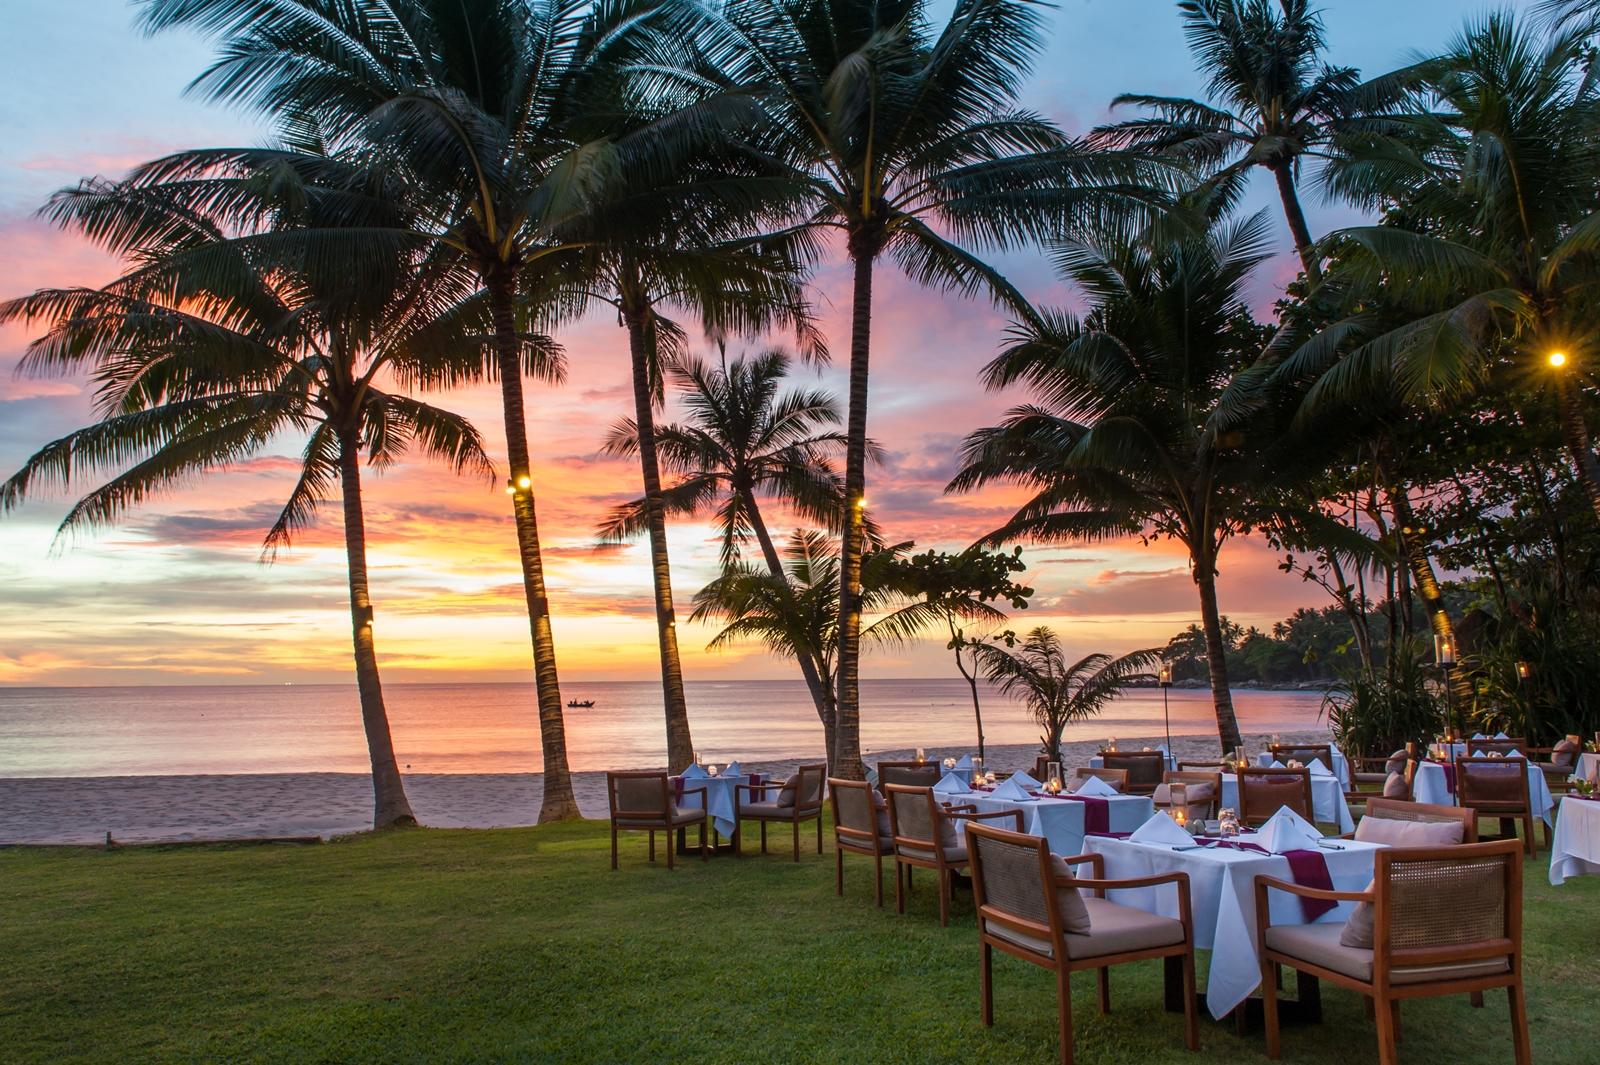 upload-large-beach-restaurant04